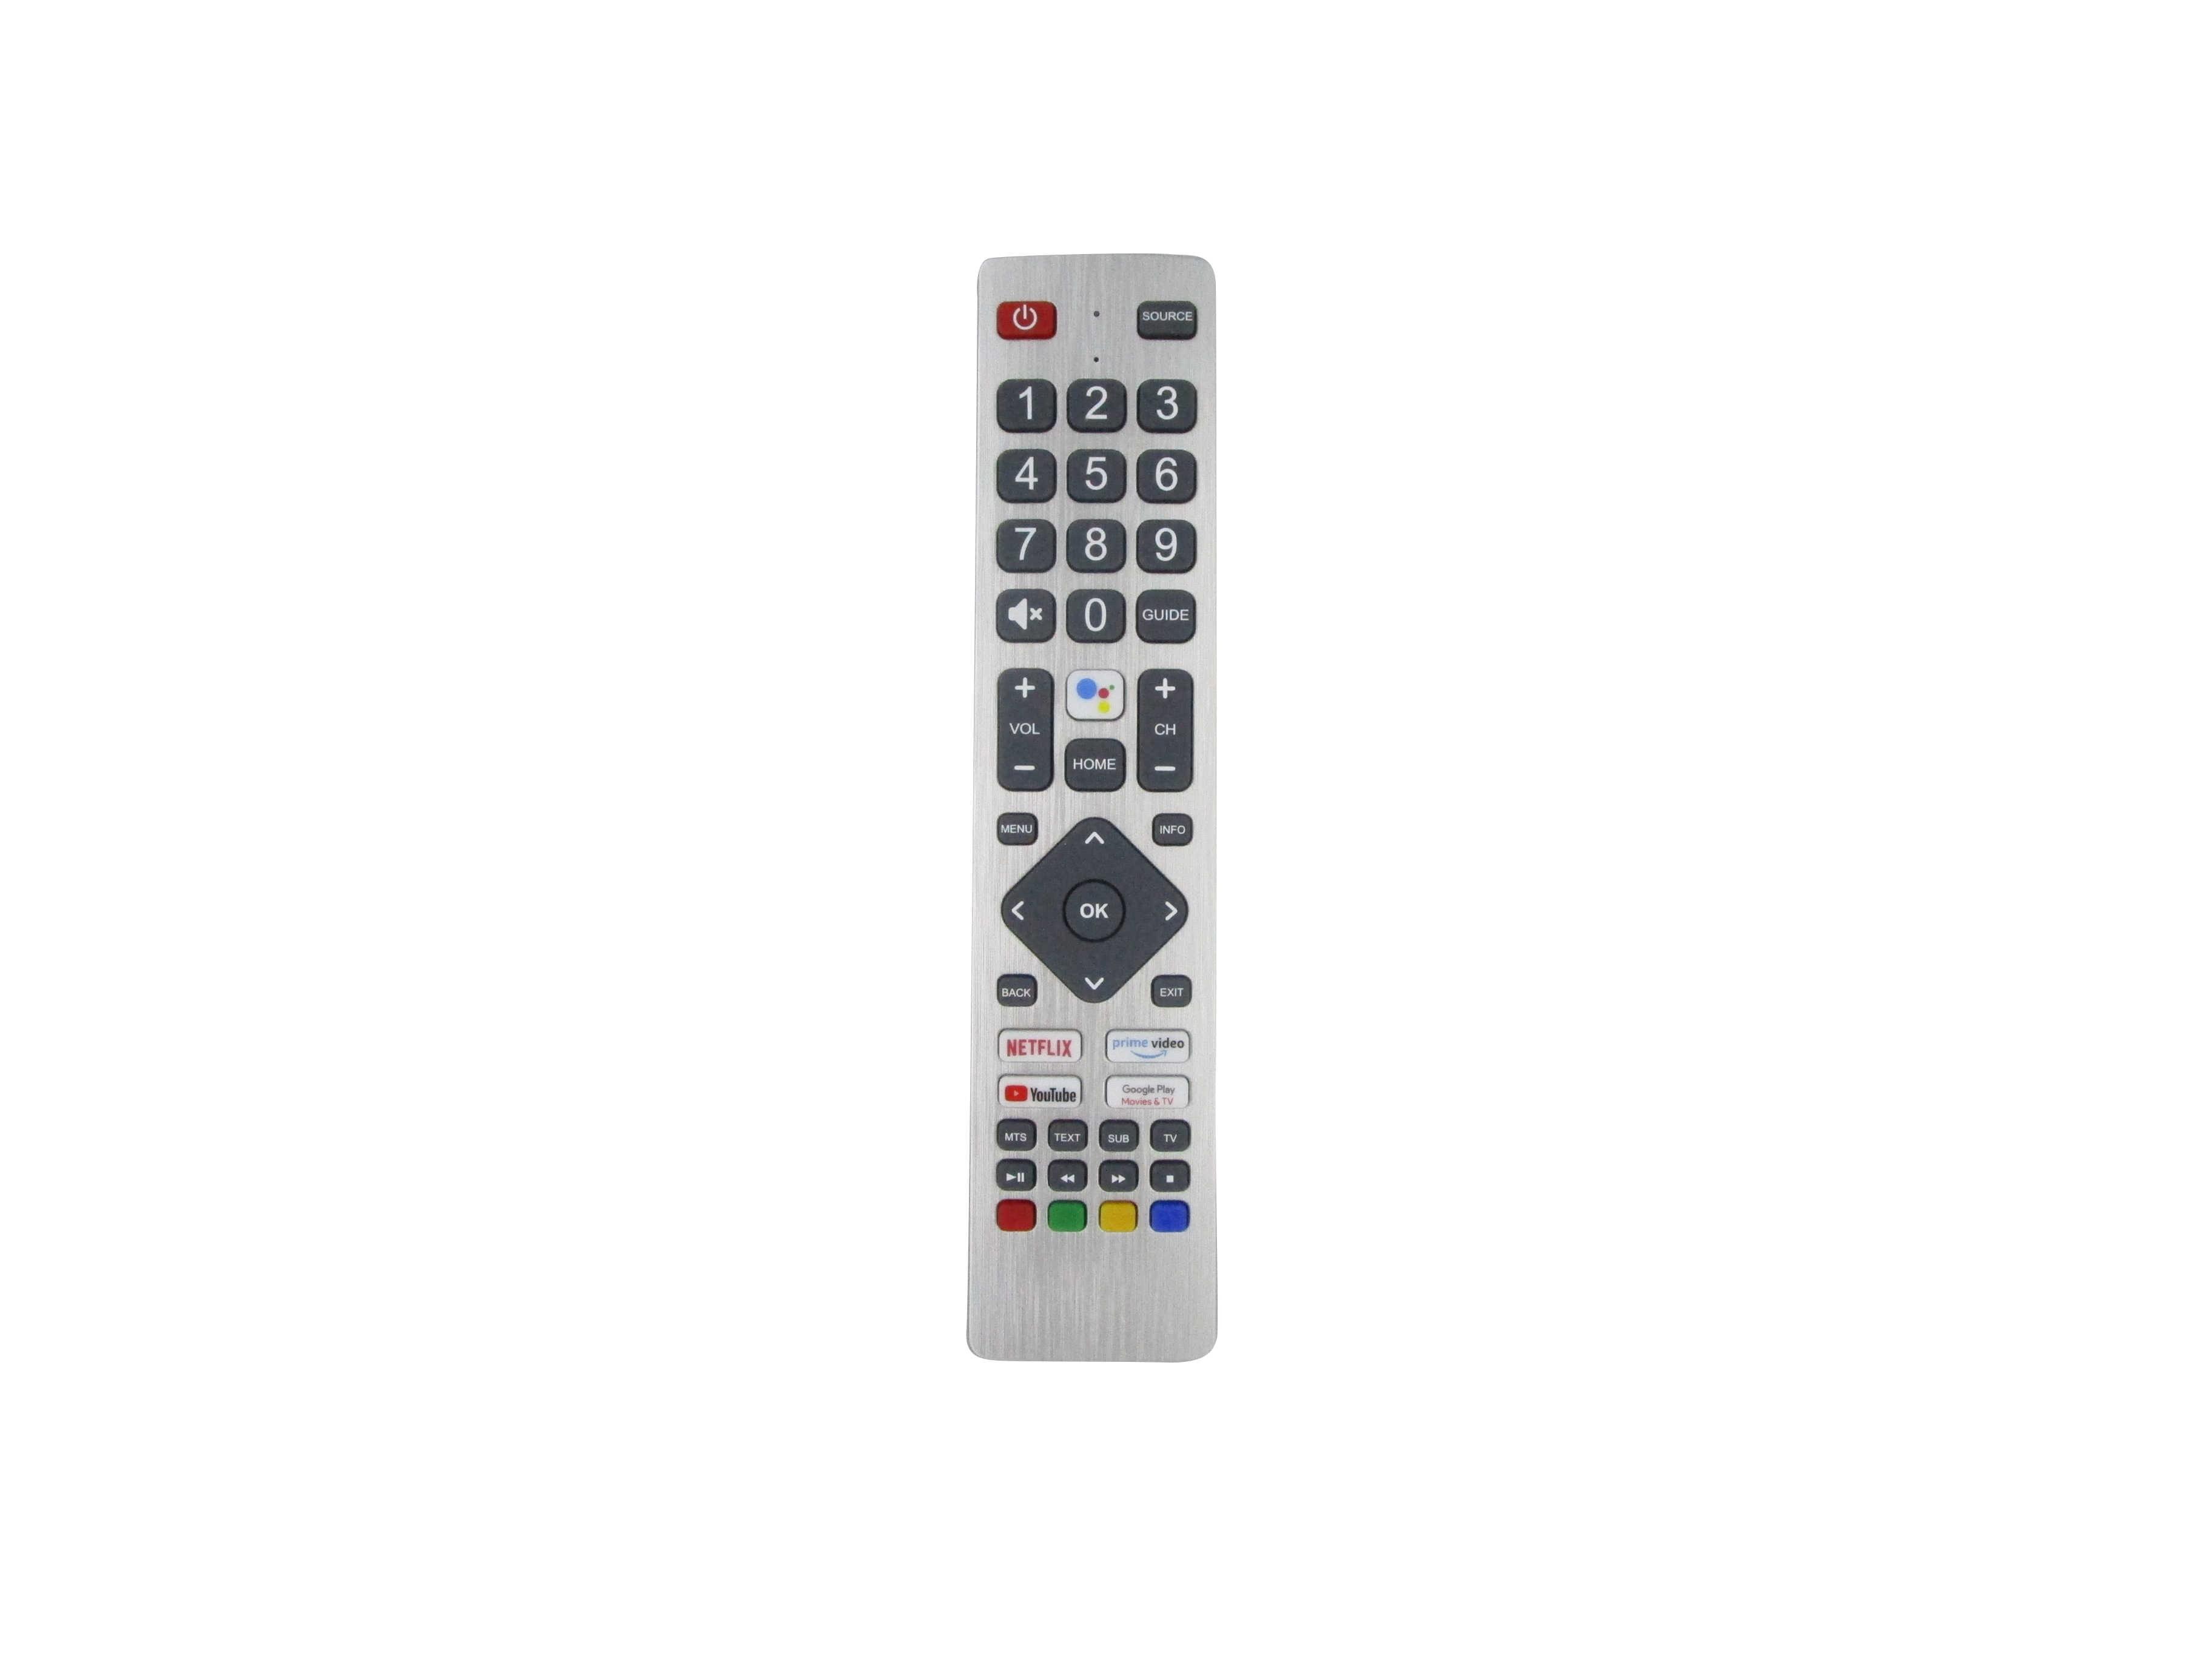 New Genuine Sharp Aquos Remote Control 3D TV SHW//RMC//0105 SHWRMC 0105C CHE5111KW